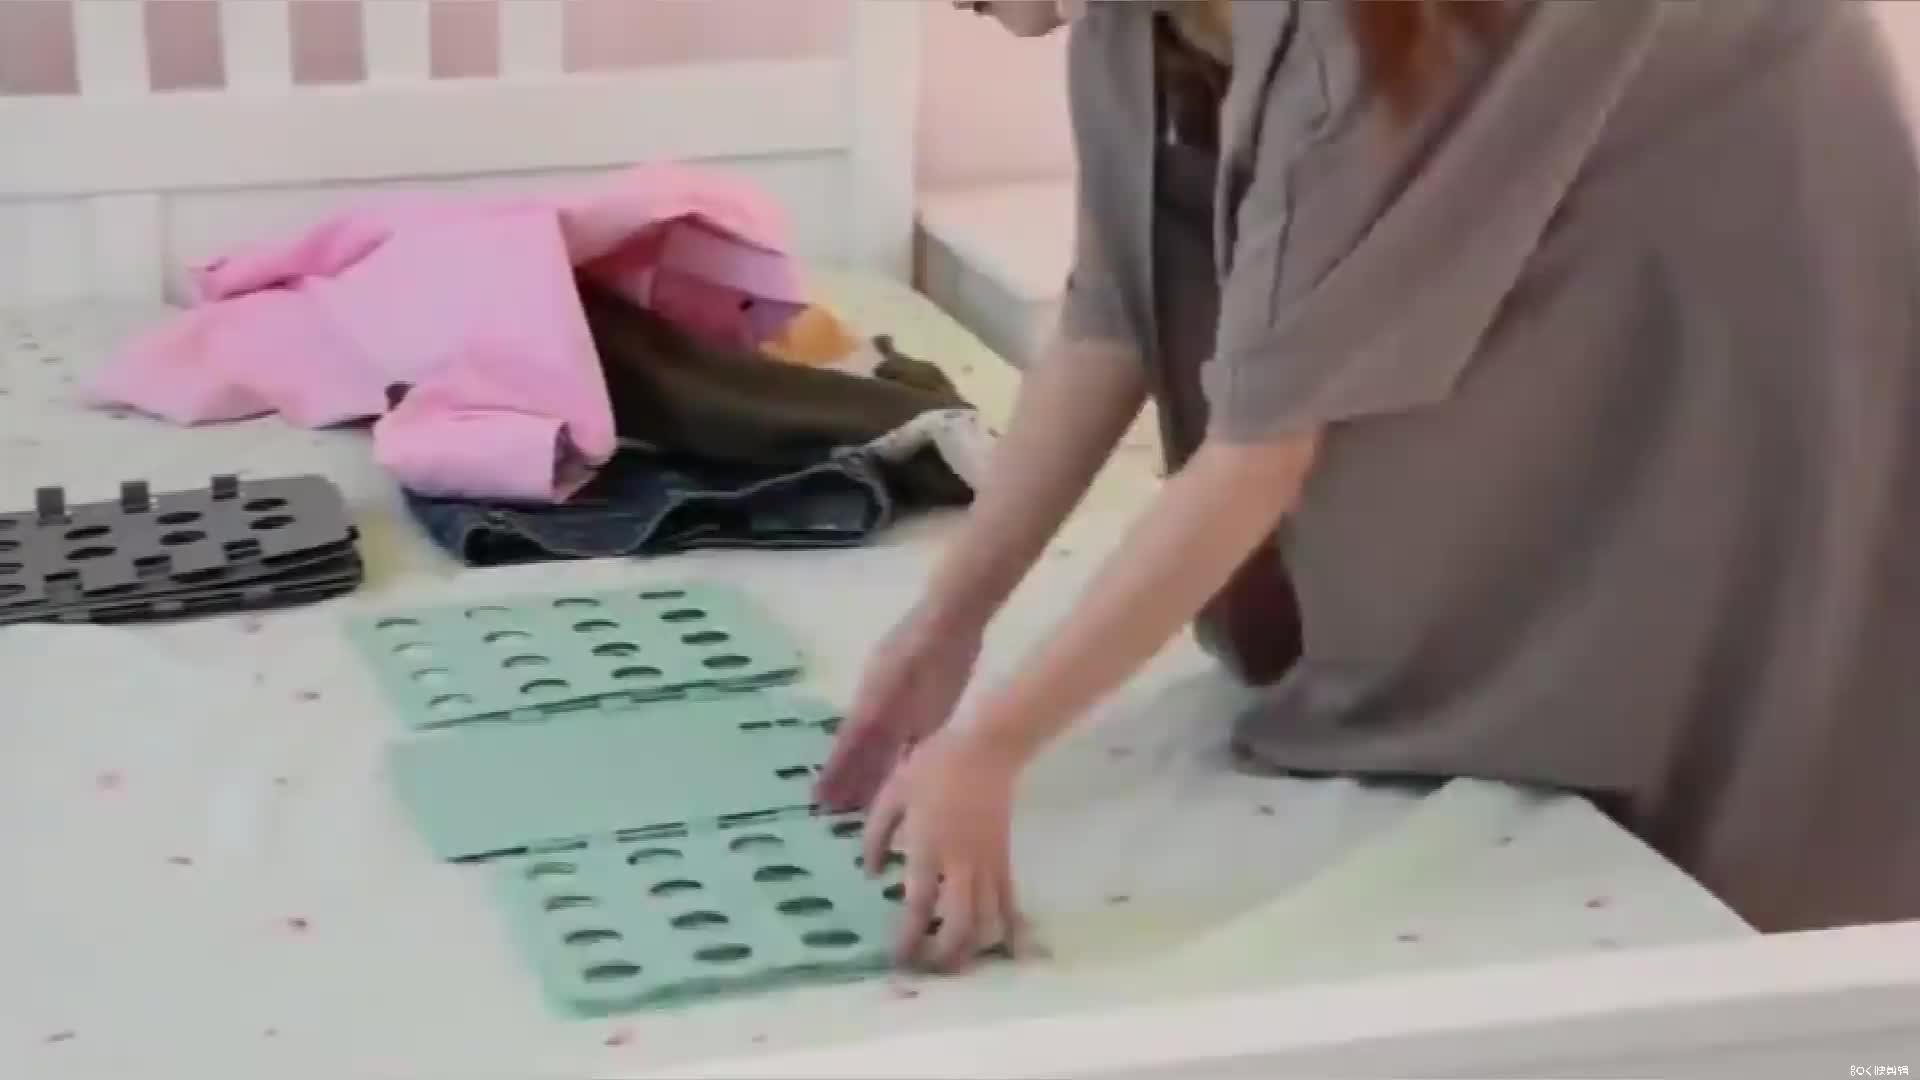 BPA Free PP Plastic T shirts folder folding boards  Easy laundry folder shirt Dress Pants Towels Clothes Folding Board